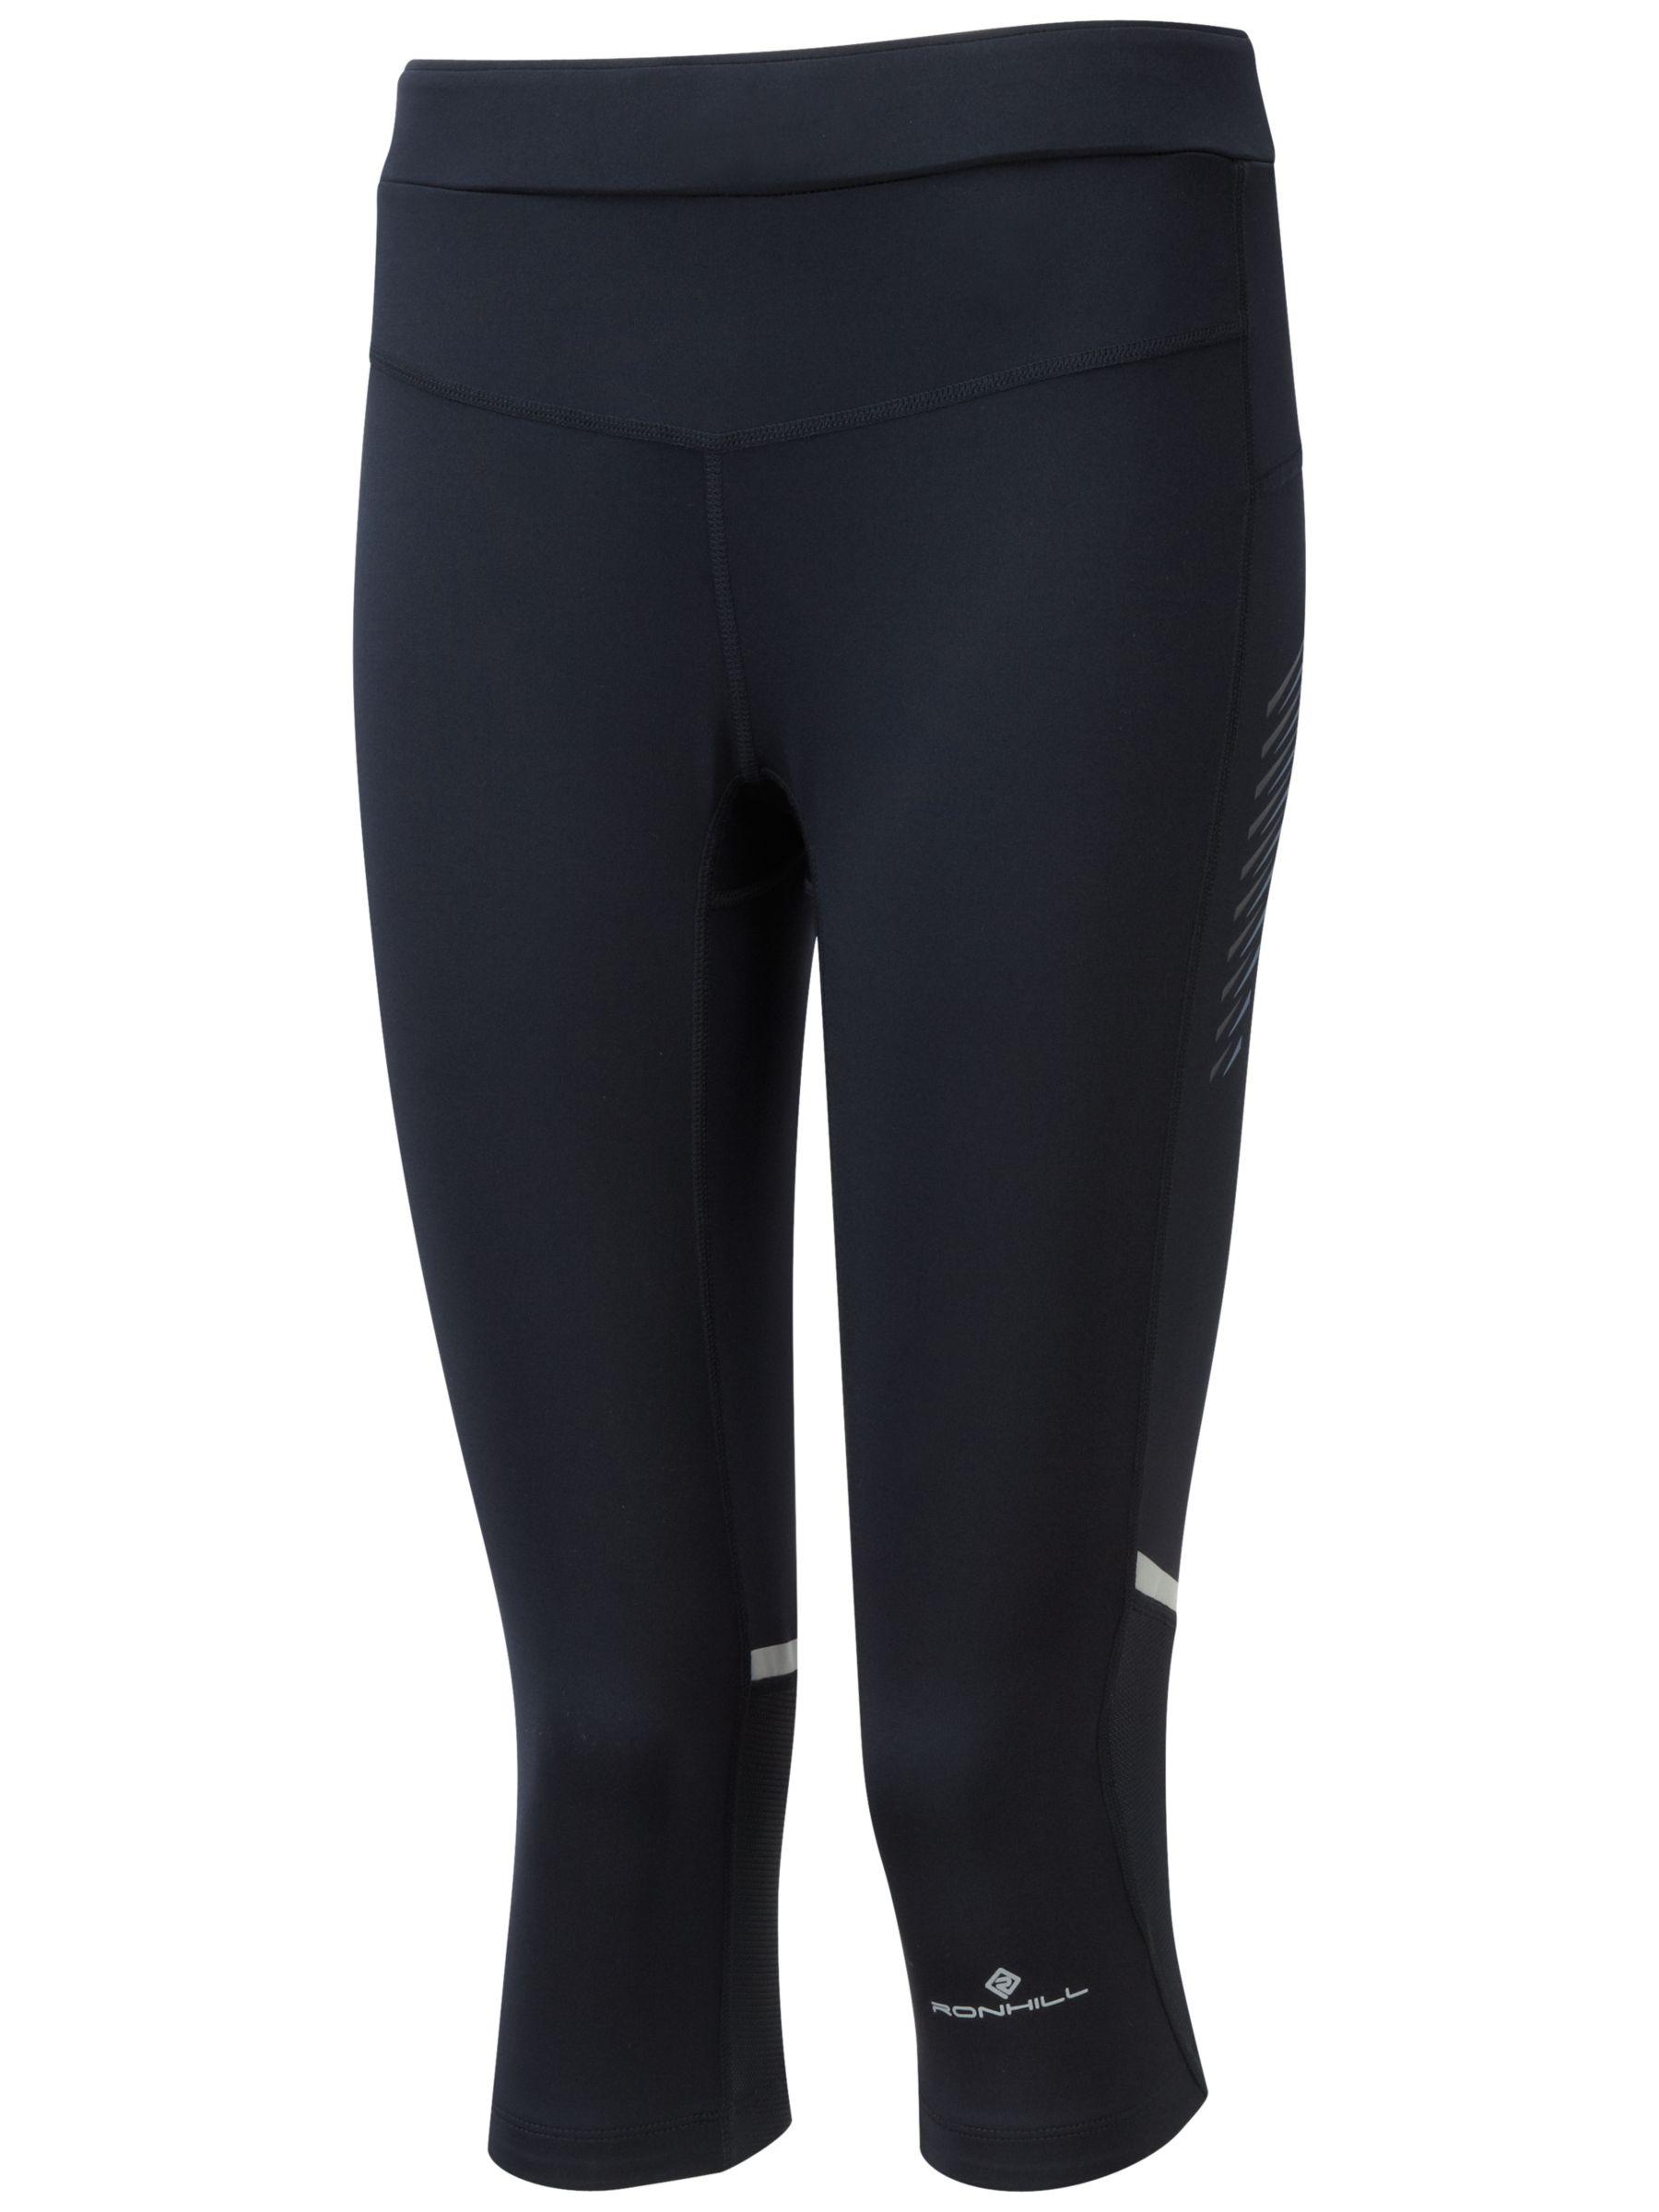 Ronhill Ronhill Powerlite Stretch Running Capris, Black